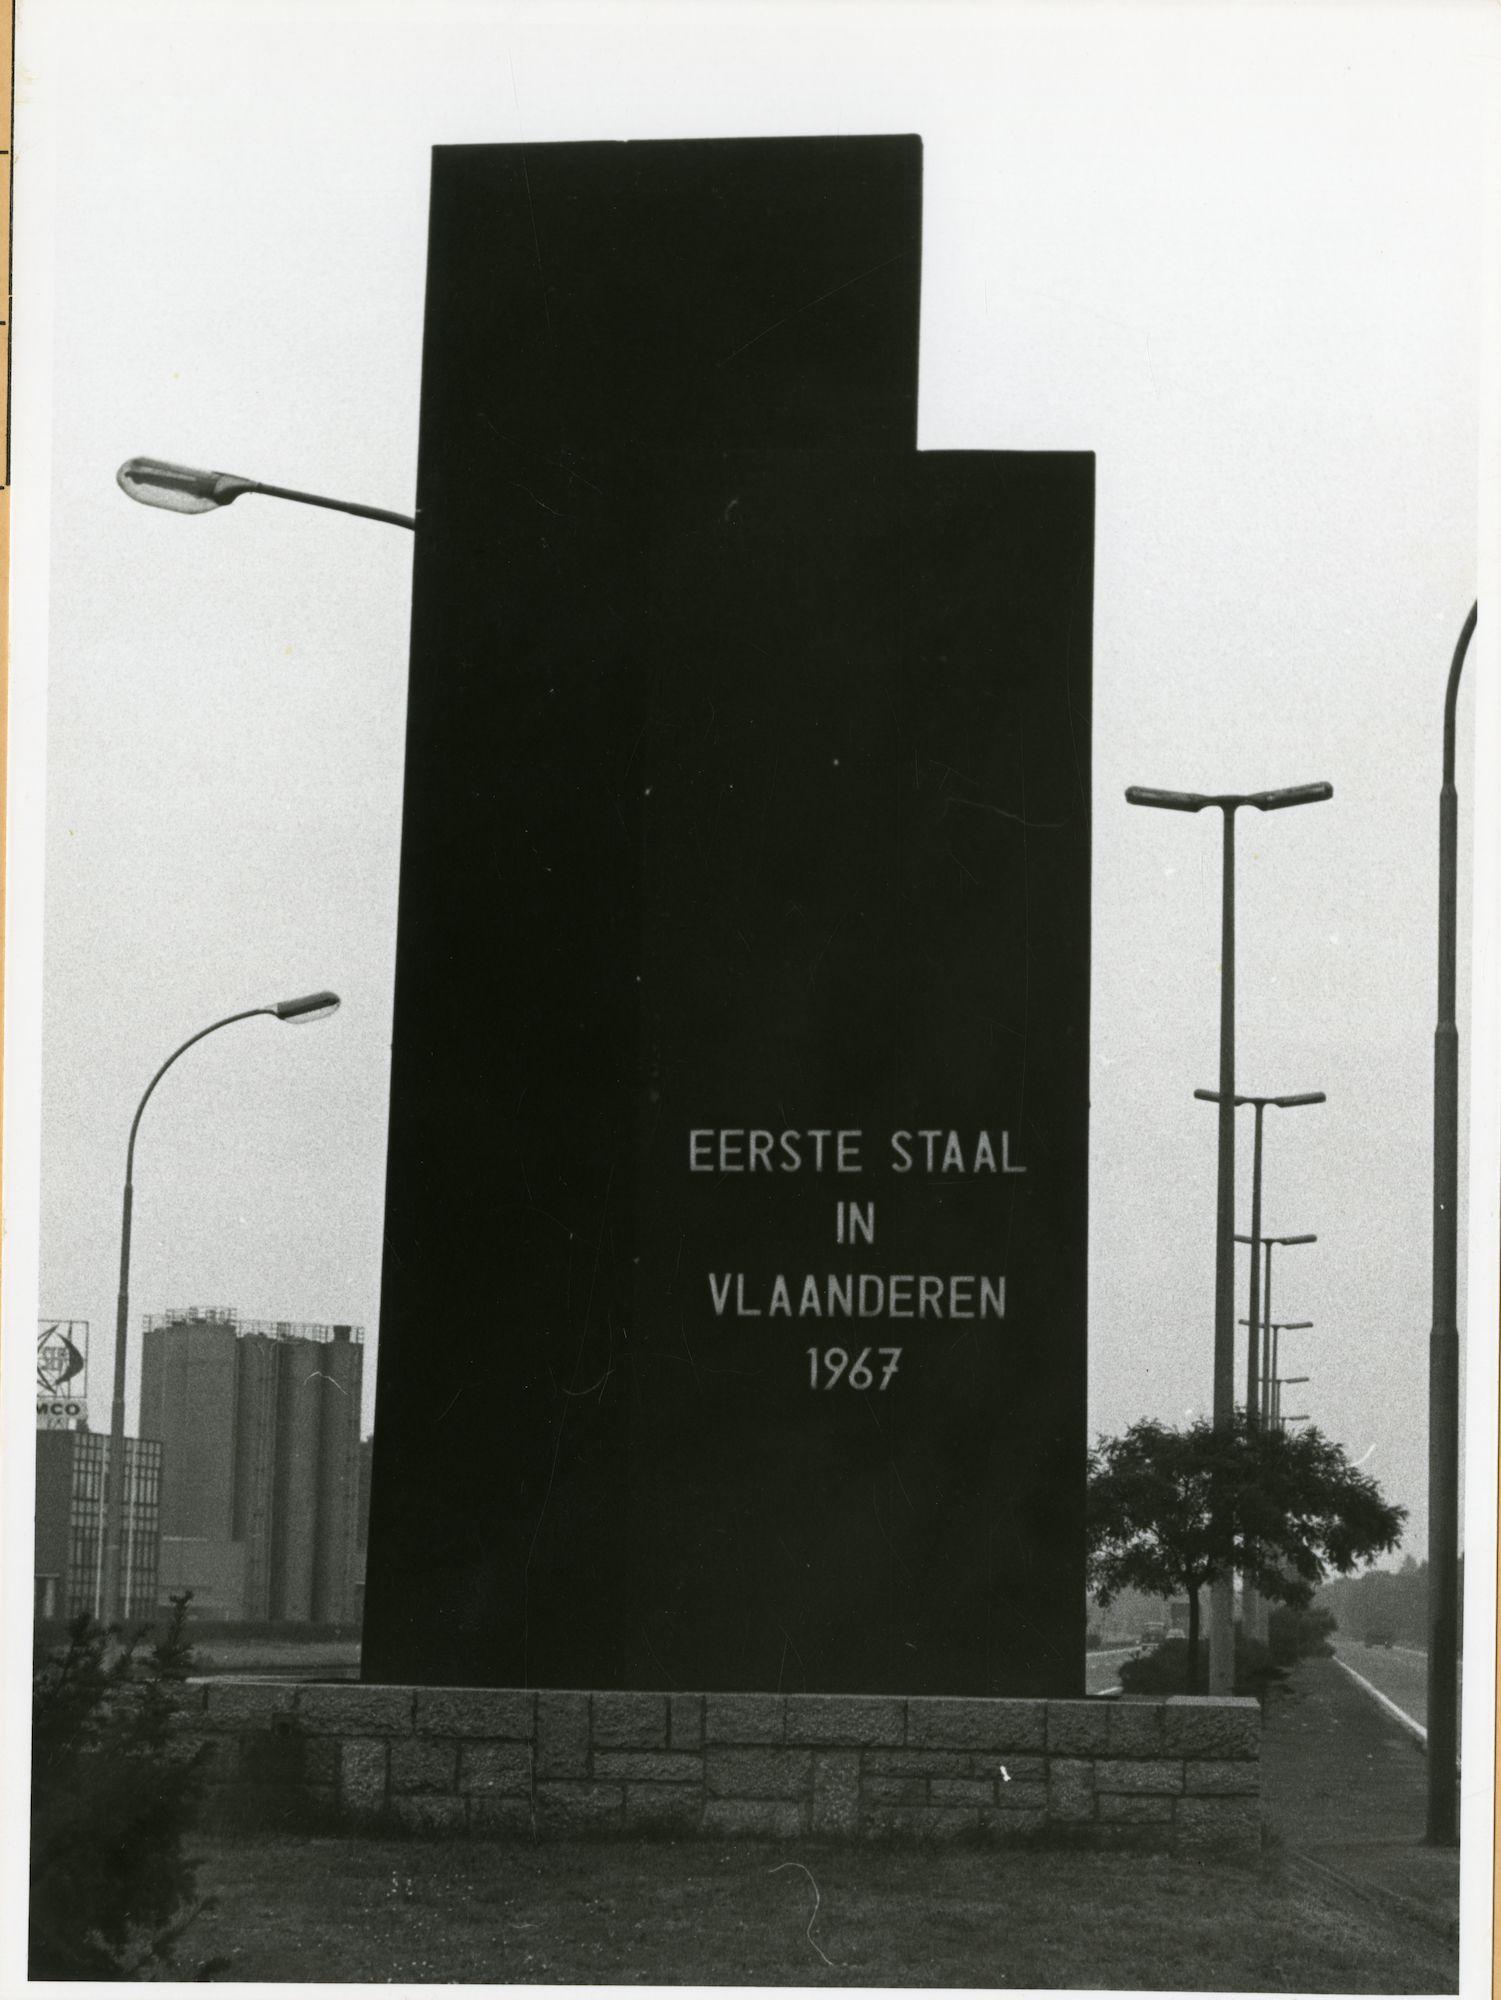 Gent: John Kennedylaan: Monument Sidmar, 1979